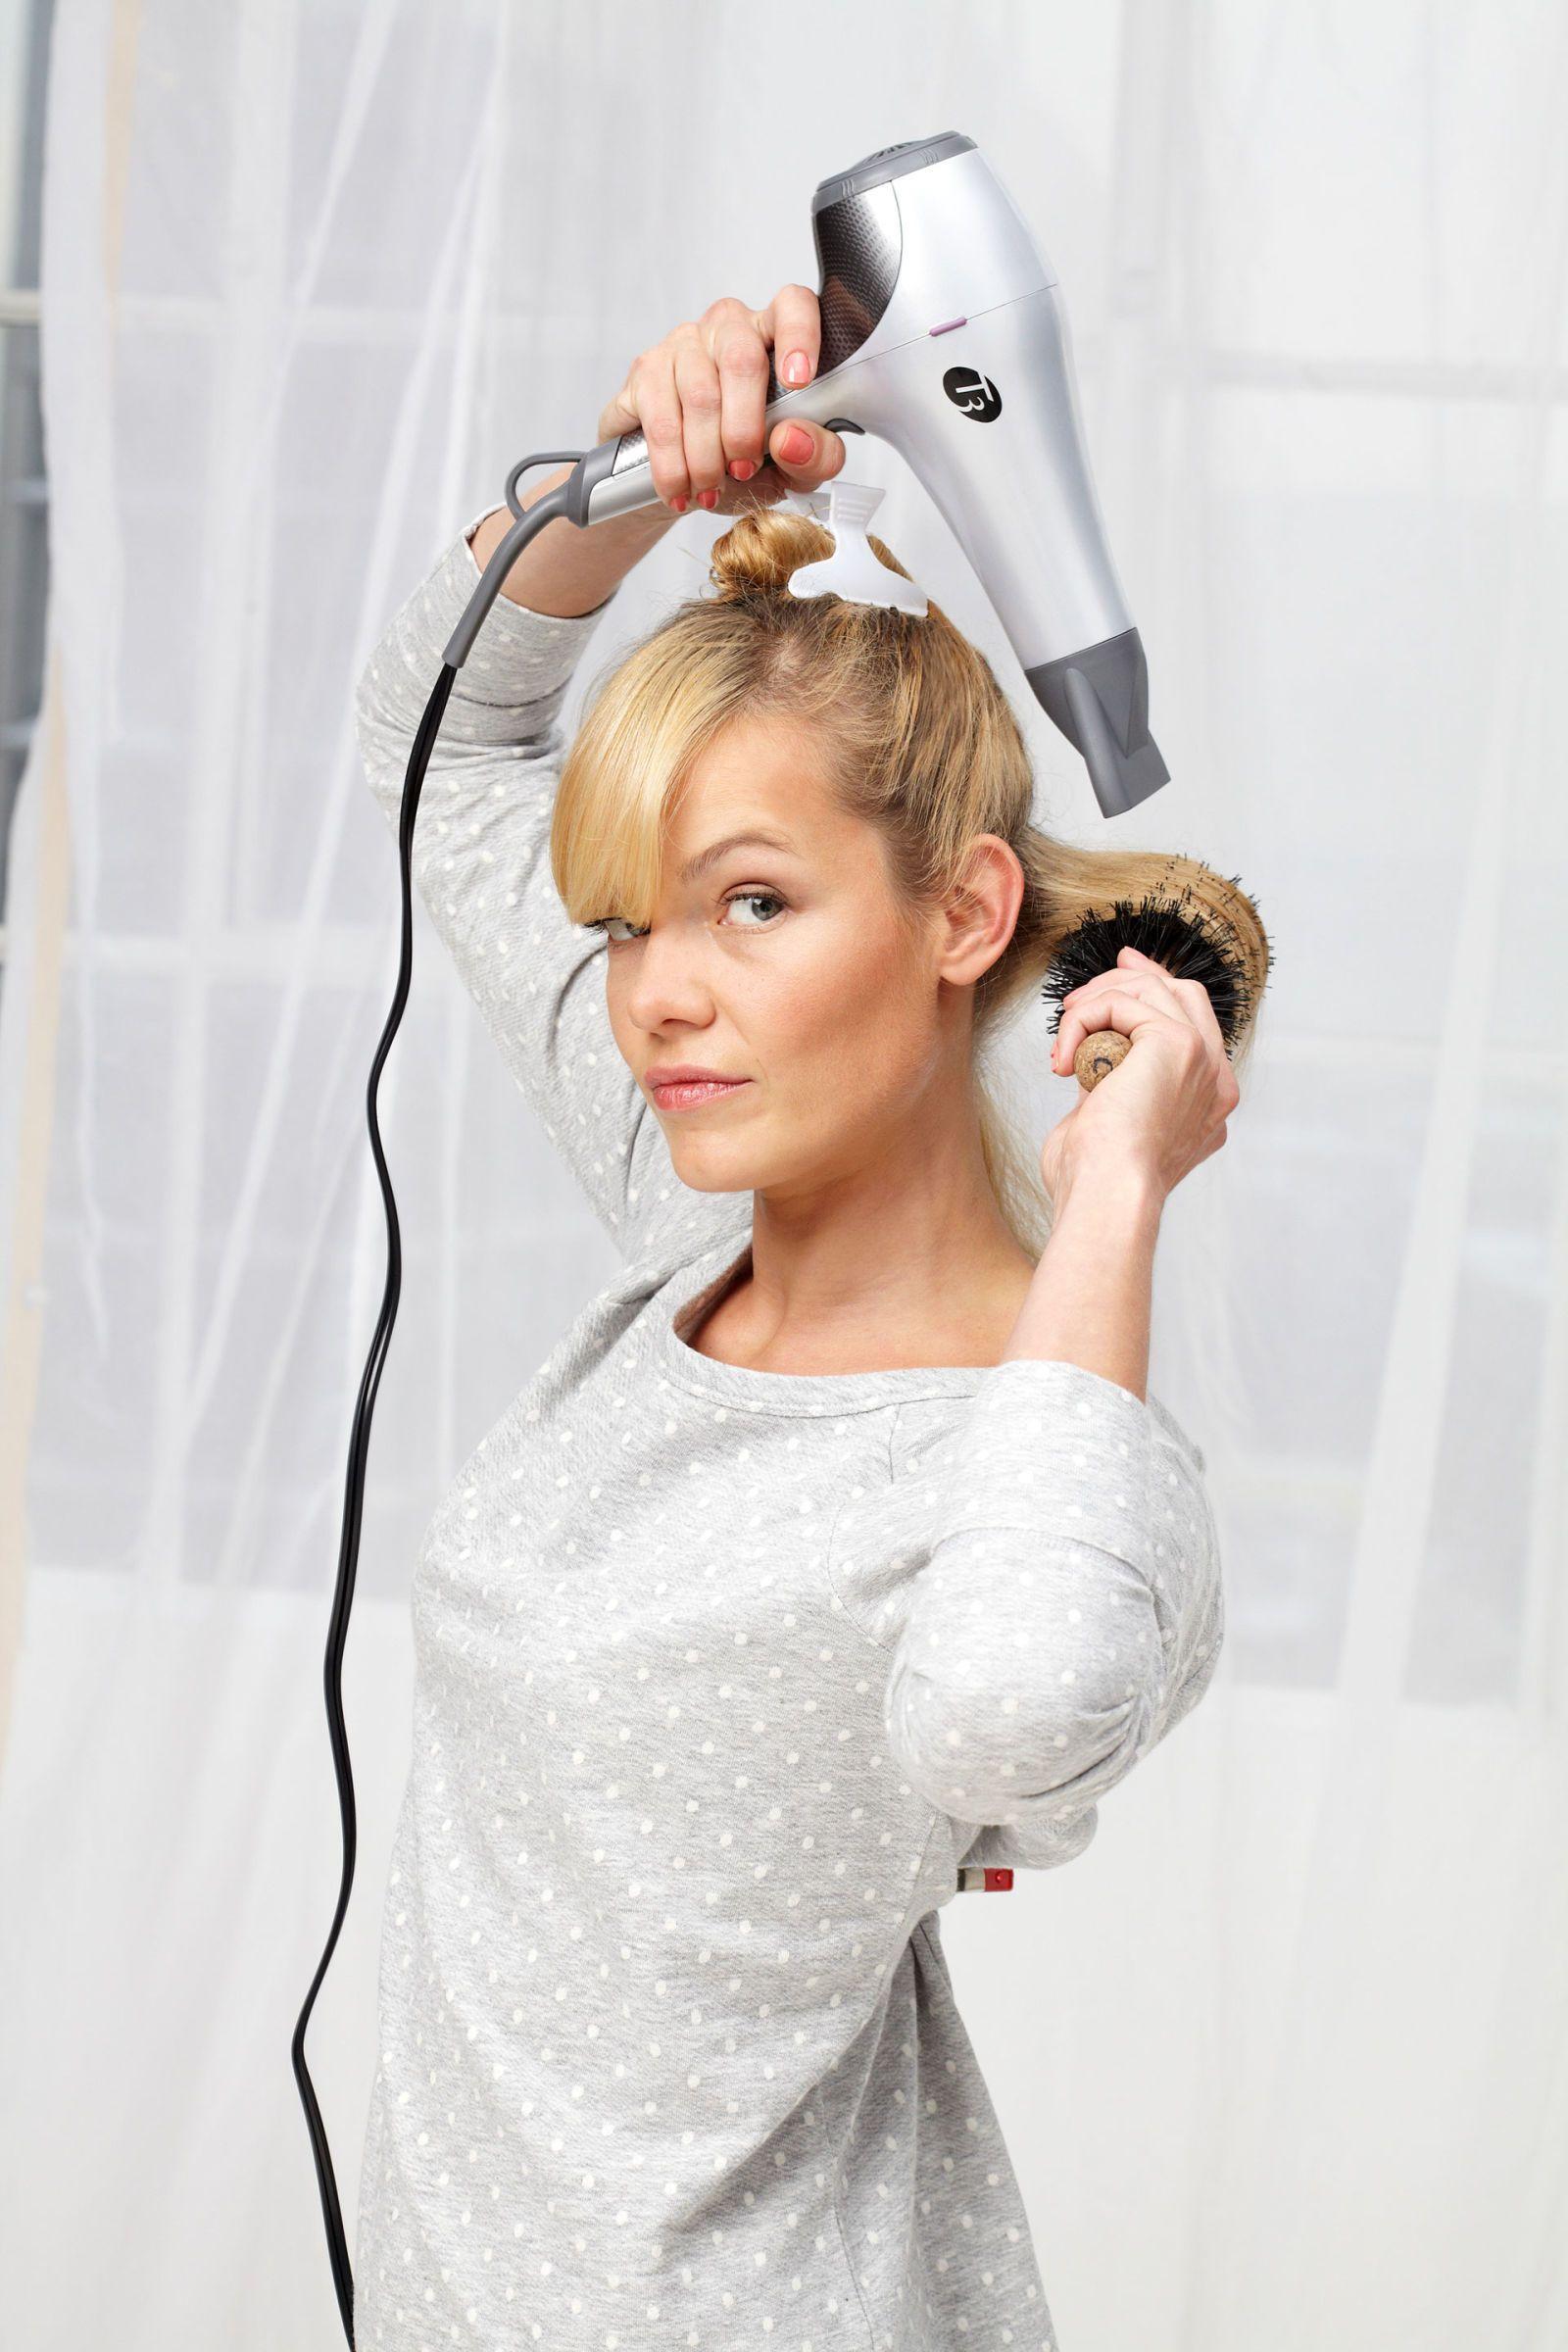 46+ Blow dry hairstyles short hair ideas